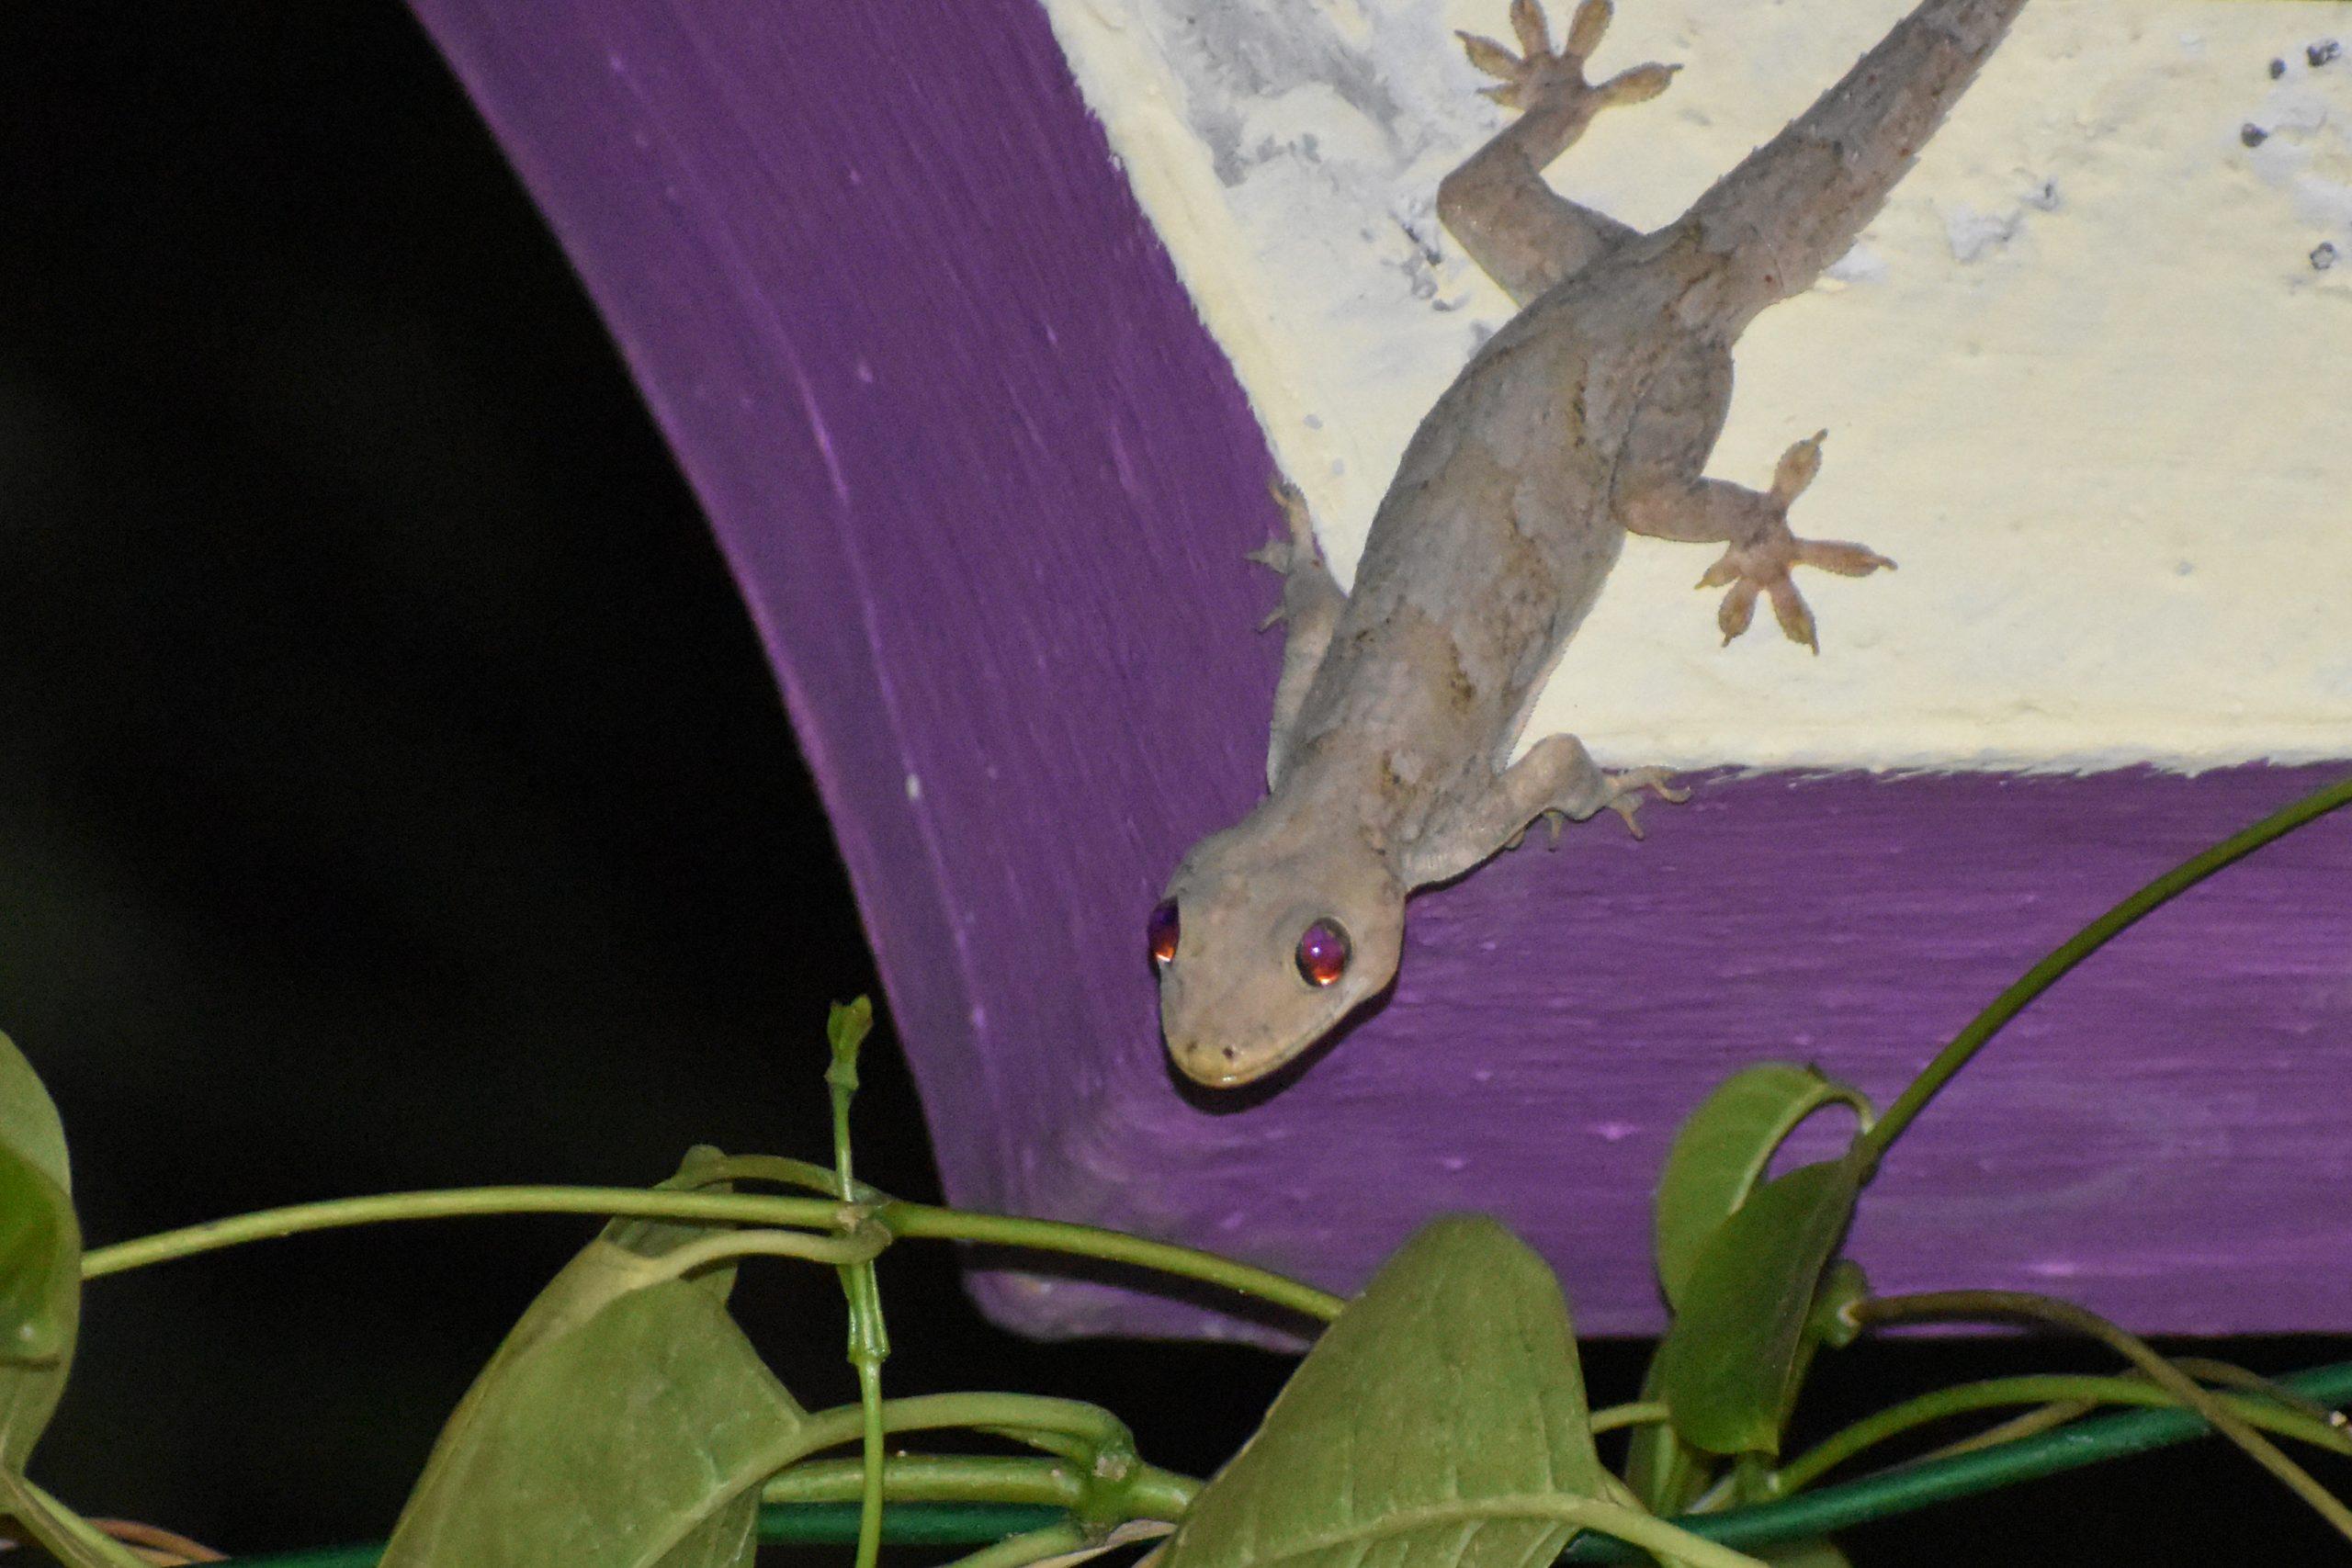 A common wall lizard